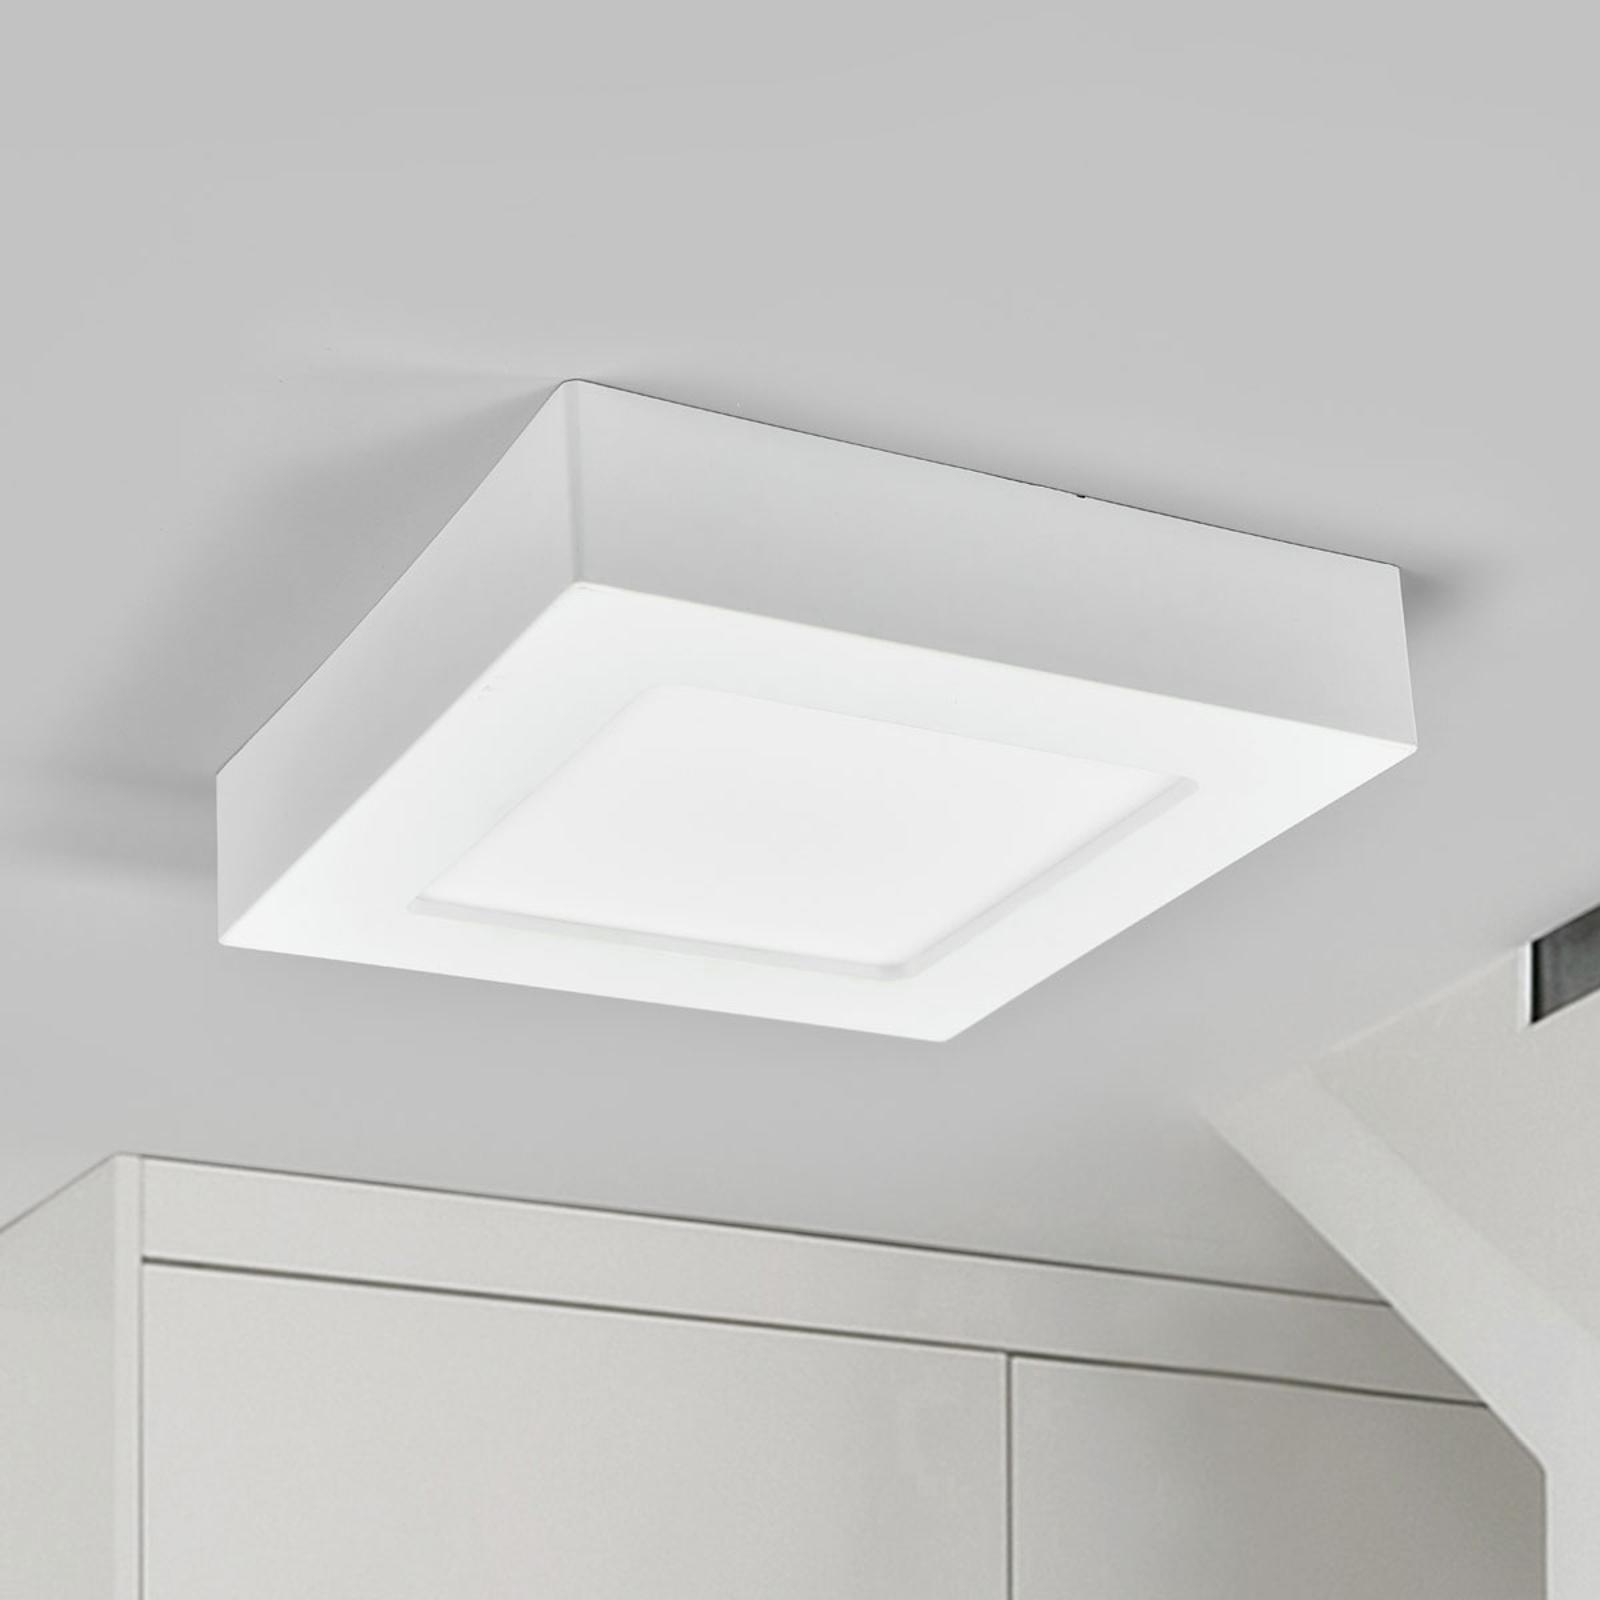 LED-taklampe Marlo, hvit, 4000K kantet 18,1cm